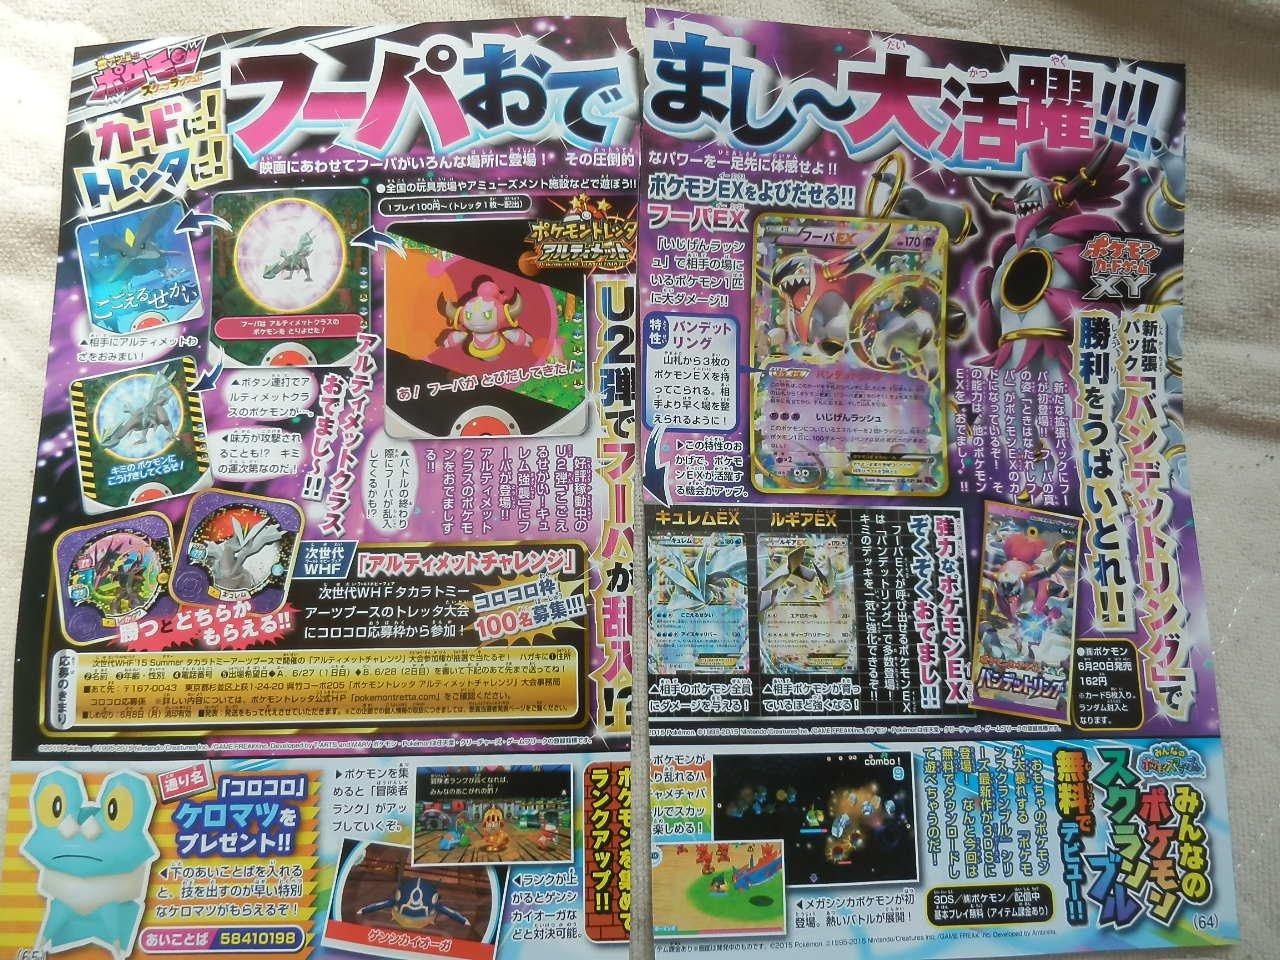 2015 June CoroCoro Leaks | pokéjungle.net | Latest Pokémon Sun ... Pokemon Mega Evolution List Leak